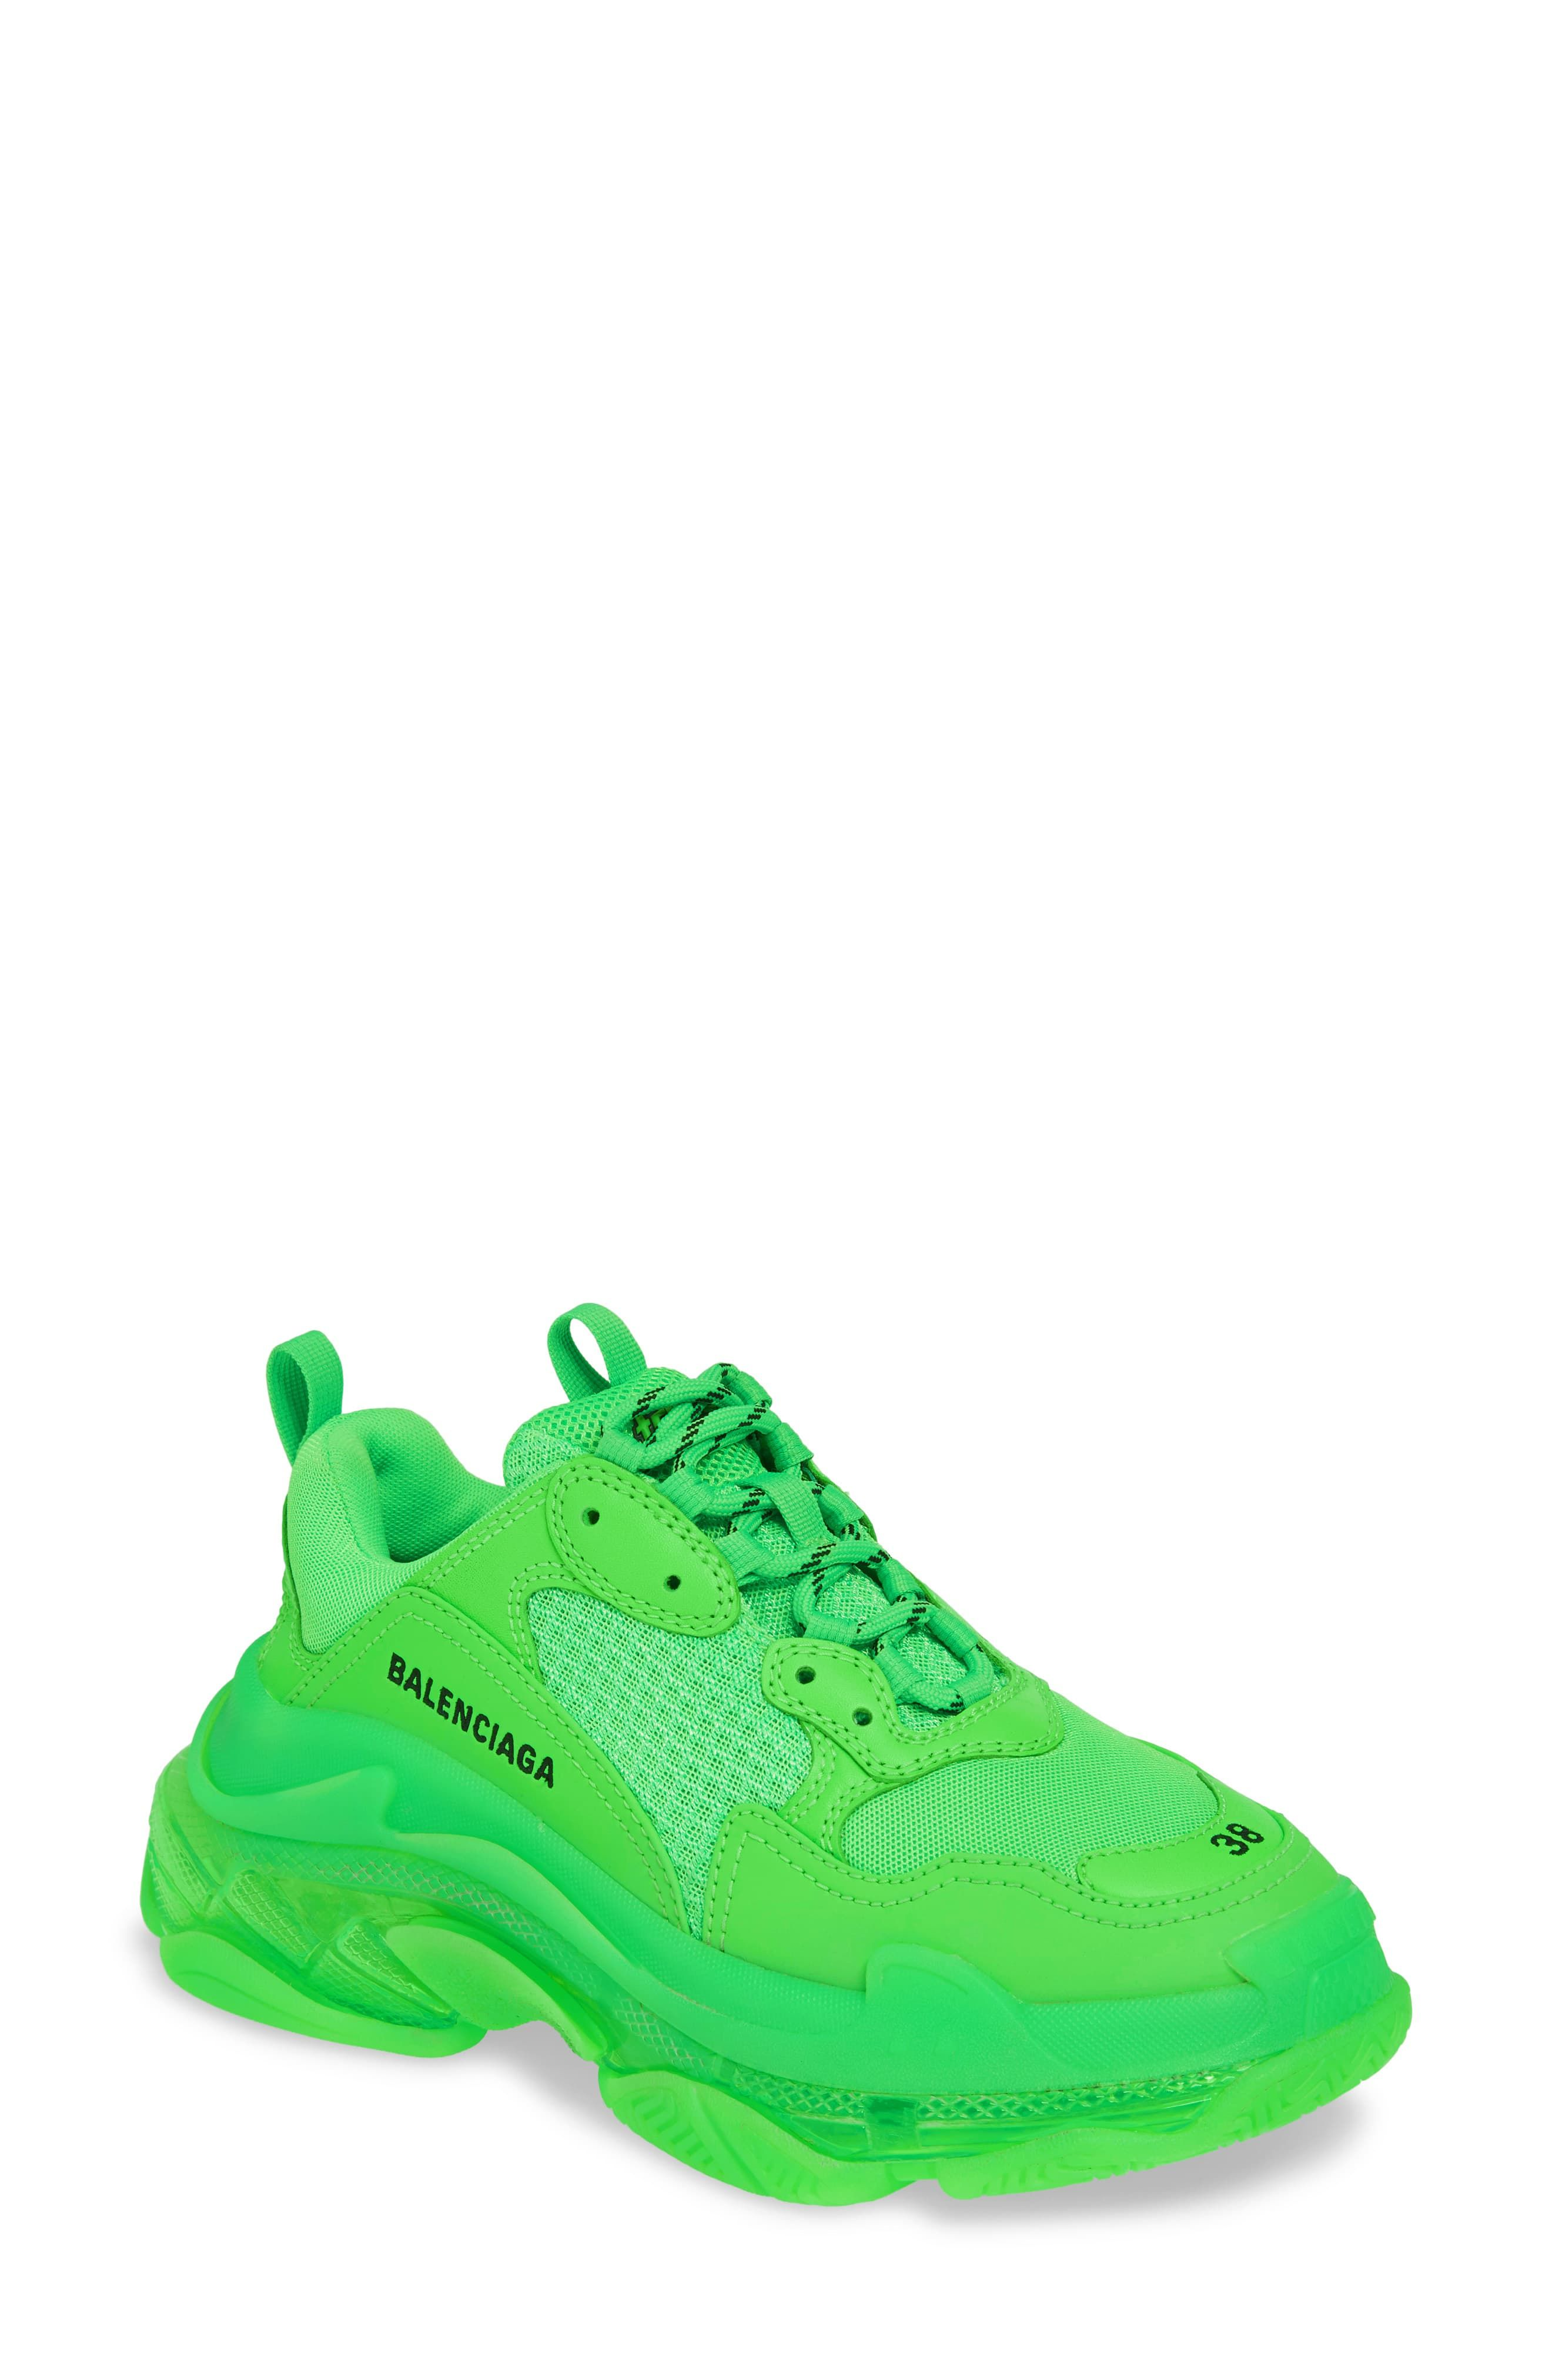 Balenciaga Triple S Low Top Sneaker Women Nordstrom Sneakers Top Sneakers Top Sneakers Women